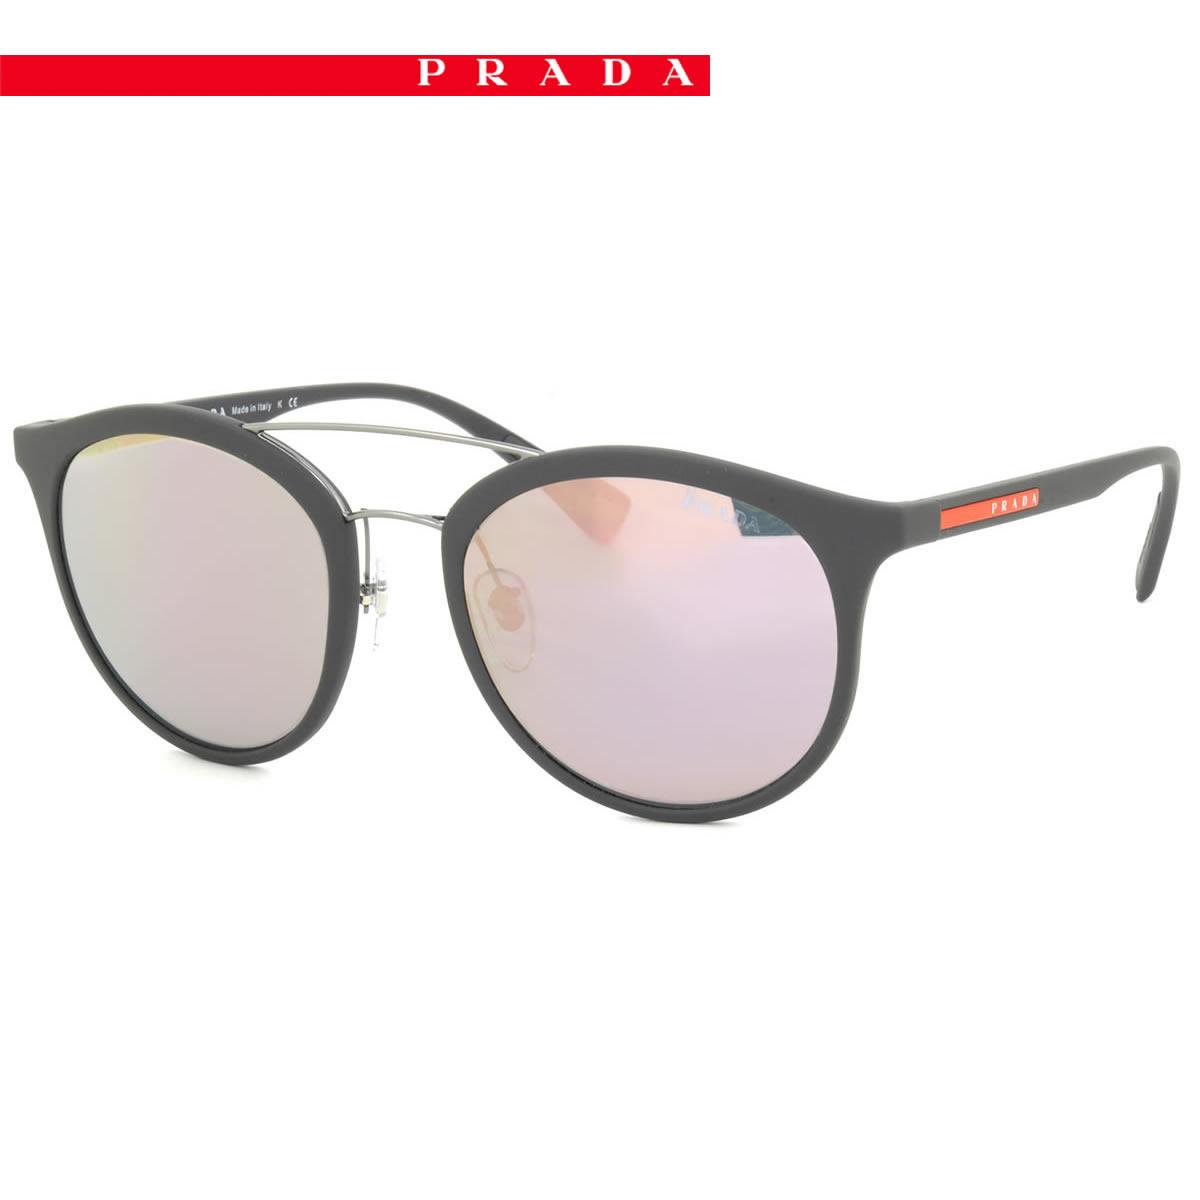 64ef35fcd08 denmark prada polarized womens sunglasses bbd65 0bc9f  sweden prada sport  sunglasses ps04rs tfz5to54 size prada sports two bridge rubber frame  pradasport ...